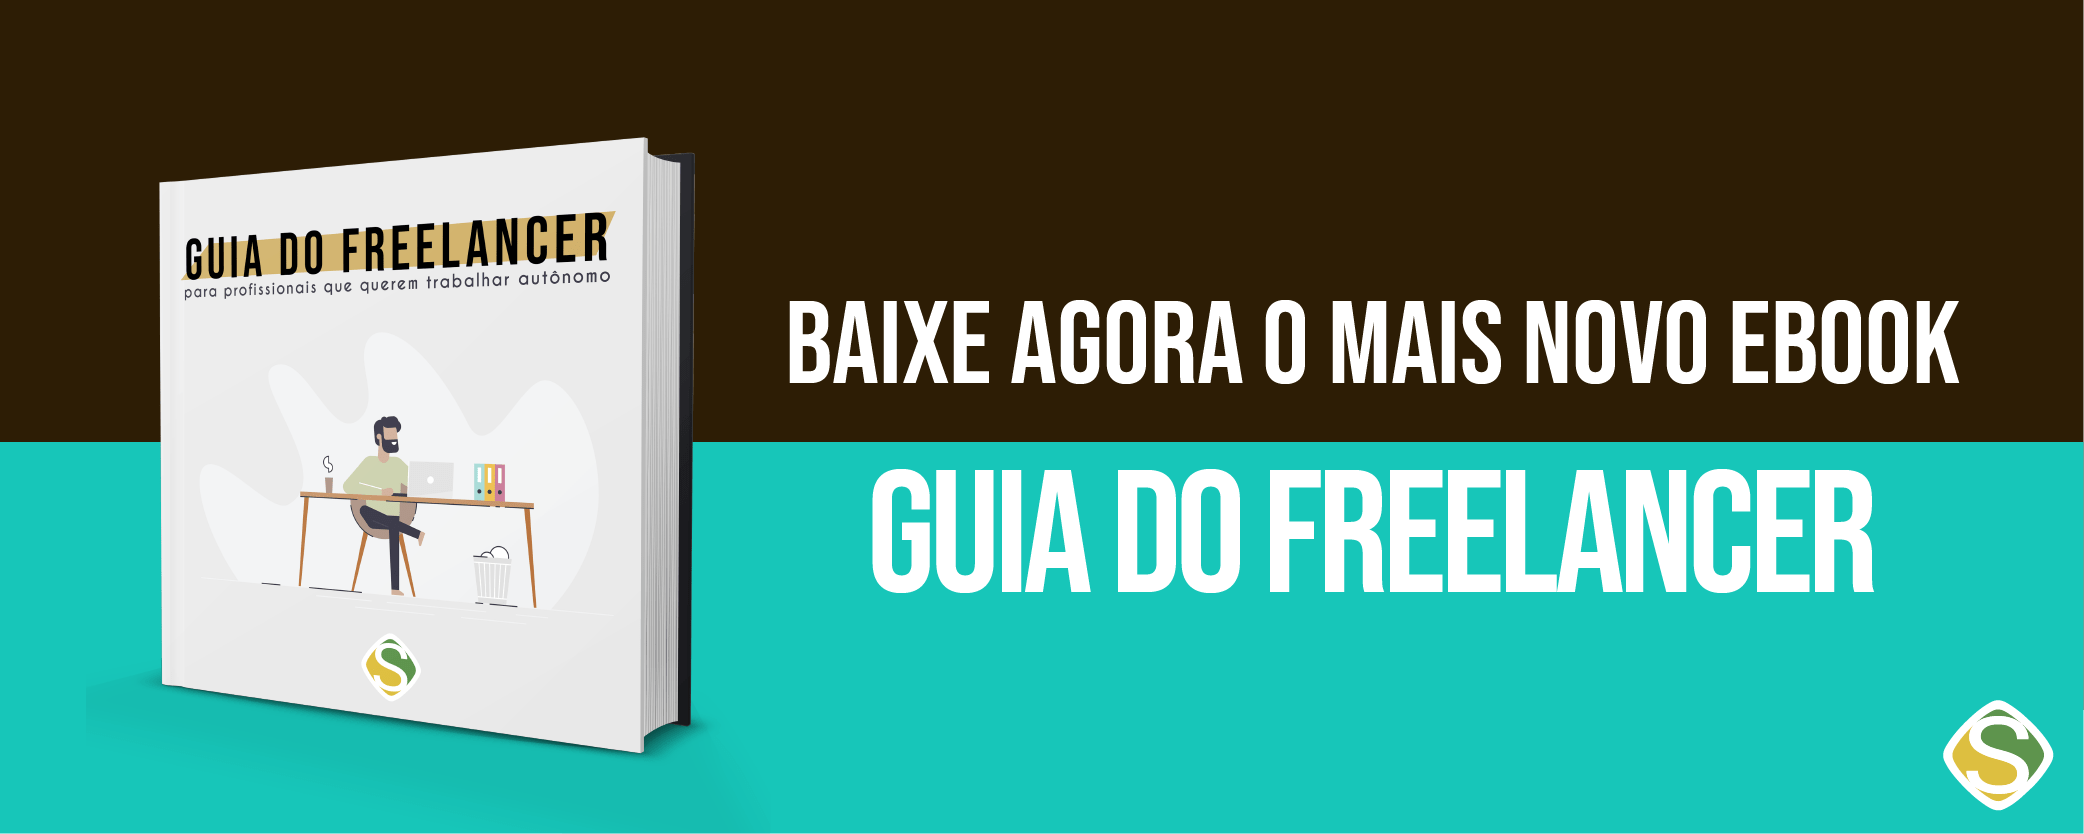 Banner do Ebook Guia do Freelancer